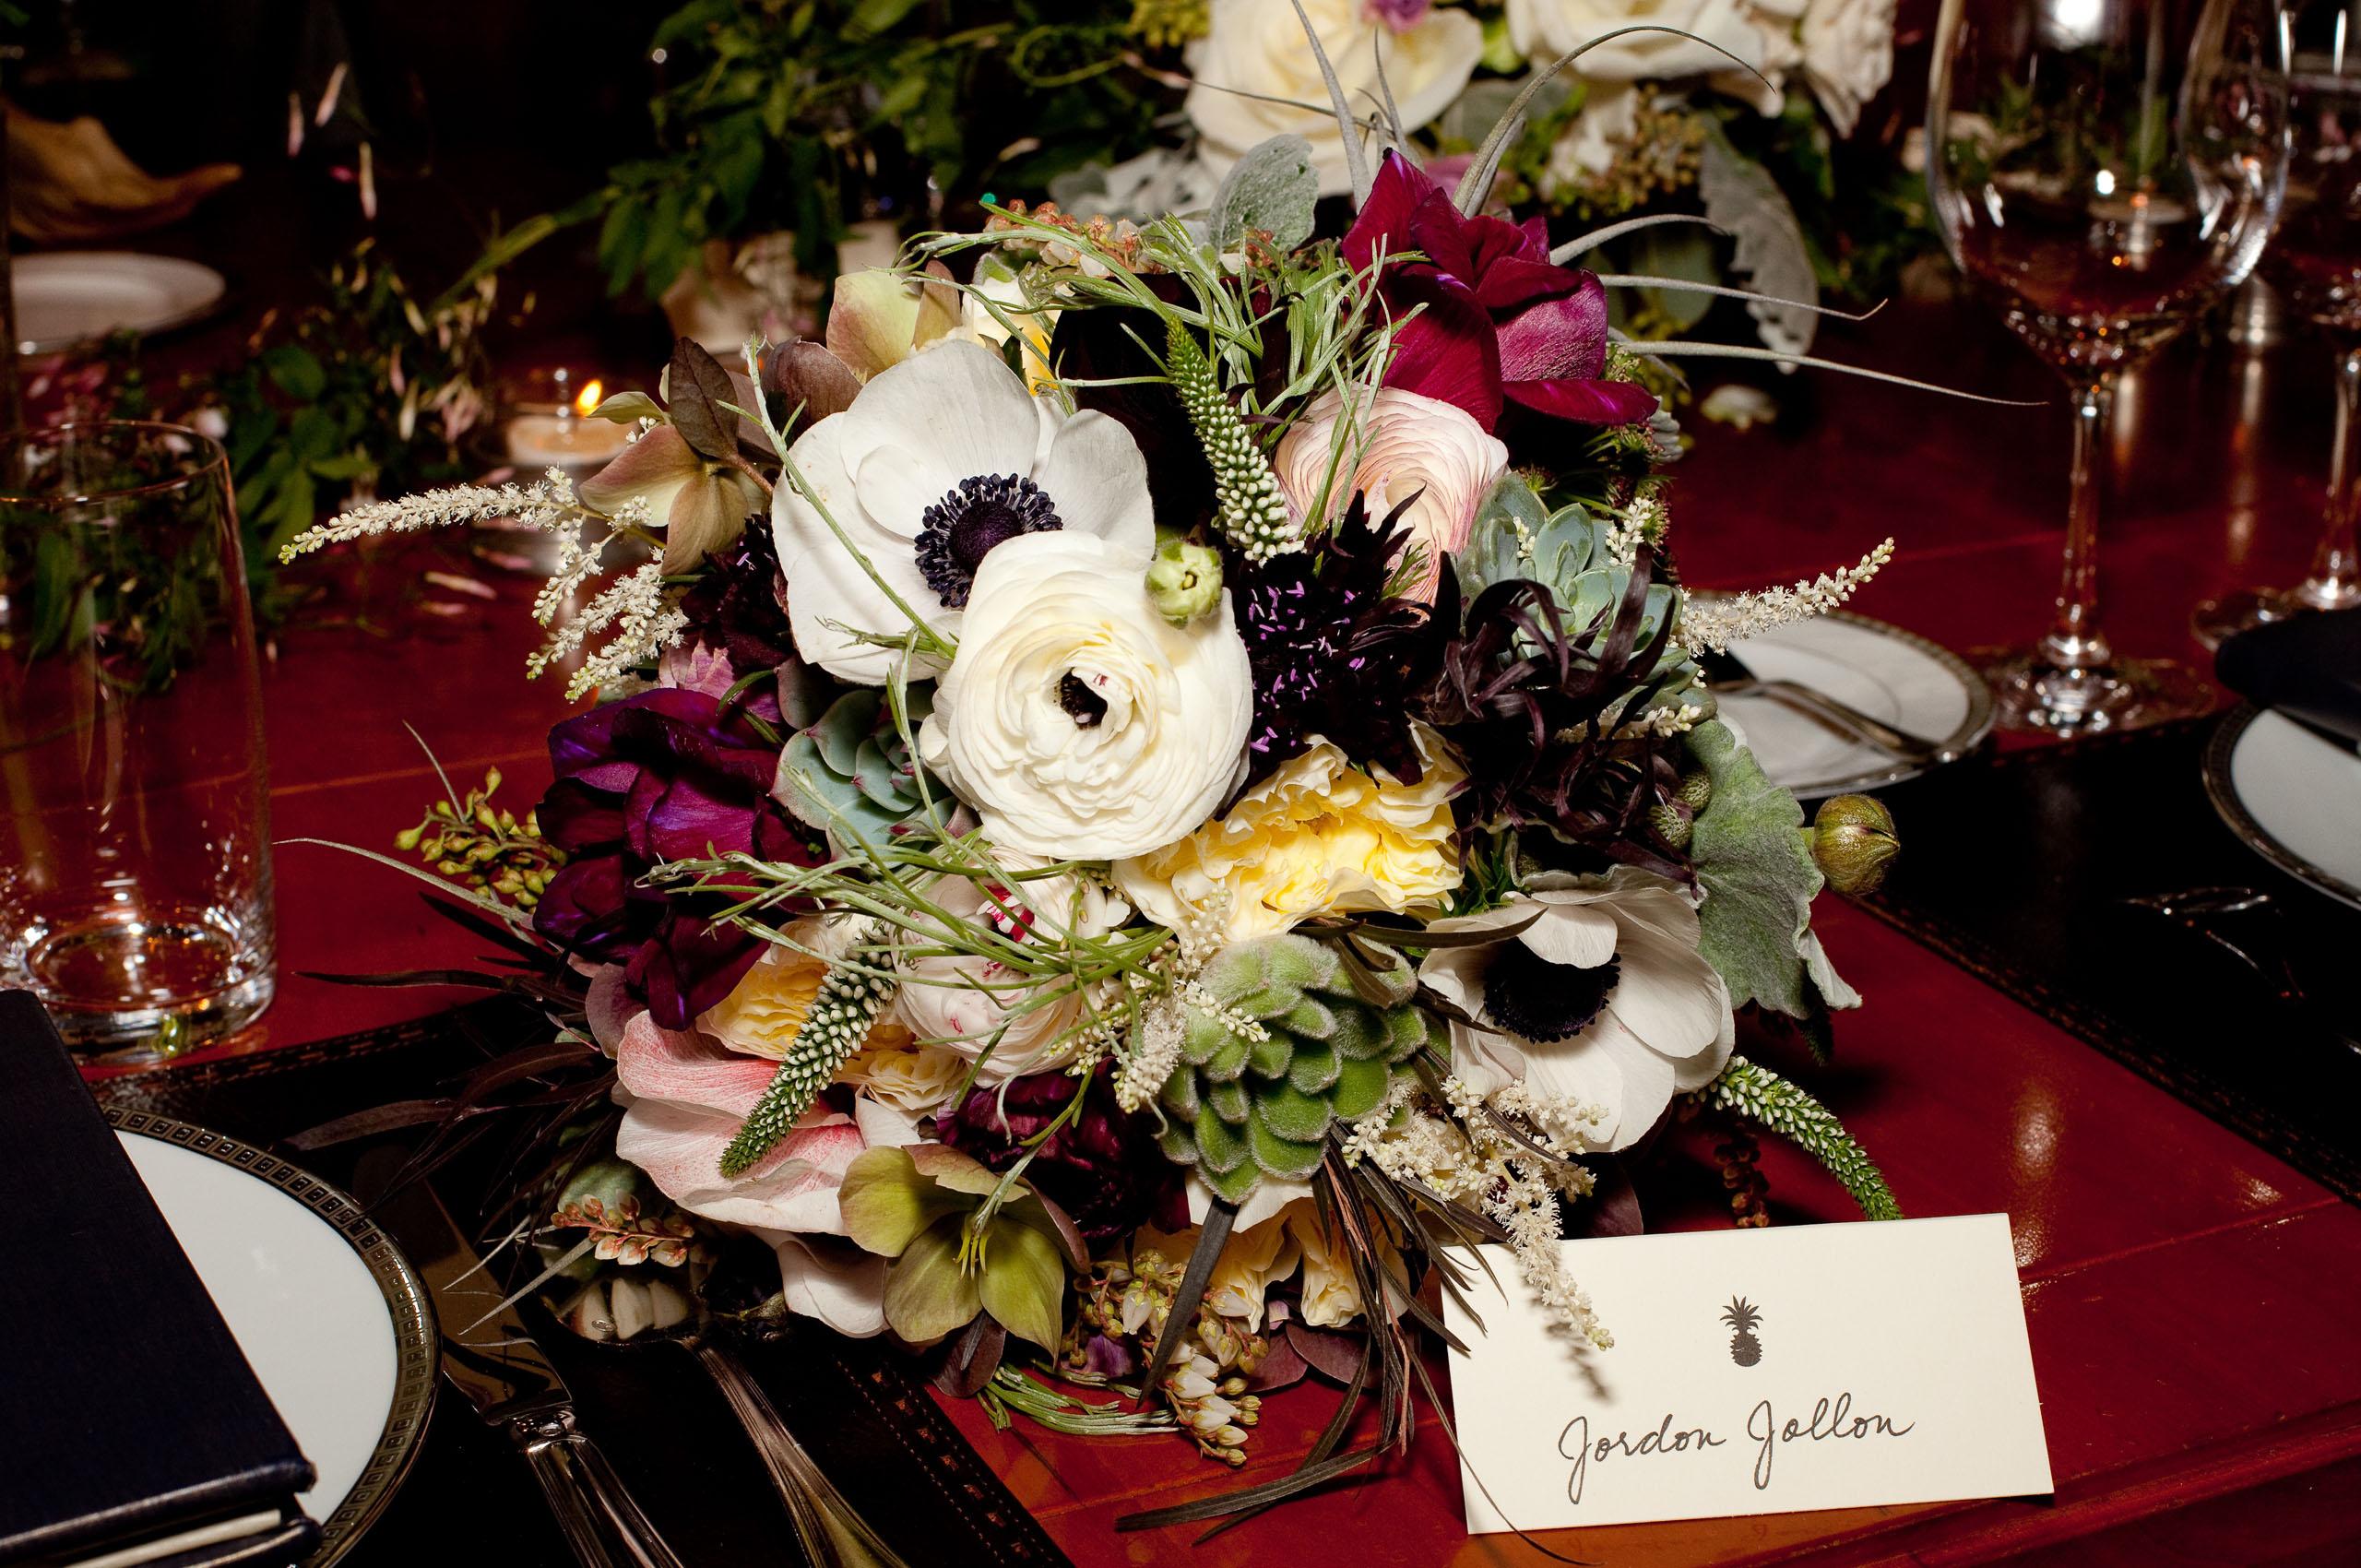 ChristopherWhite_Jordan_wedding_9.jpg